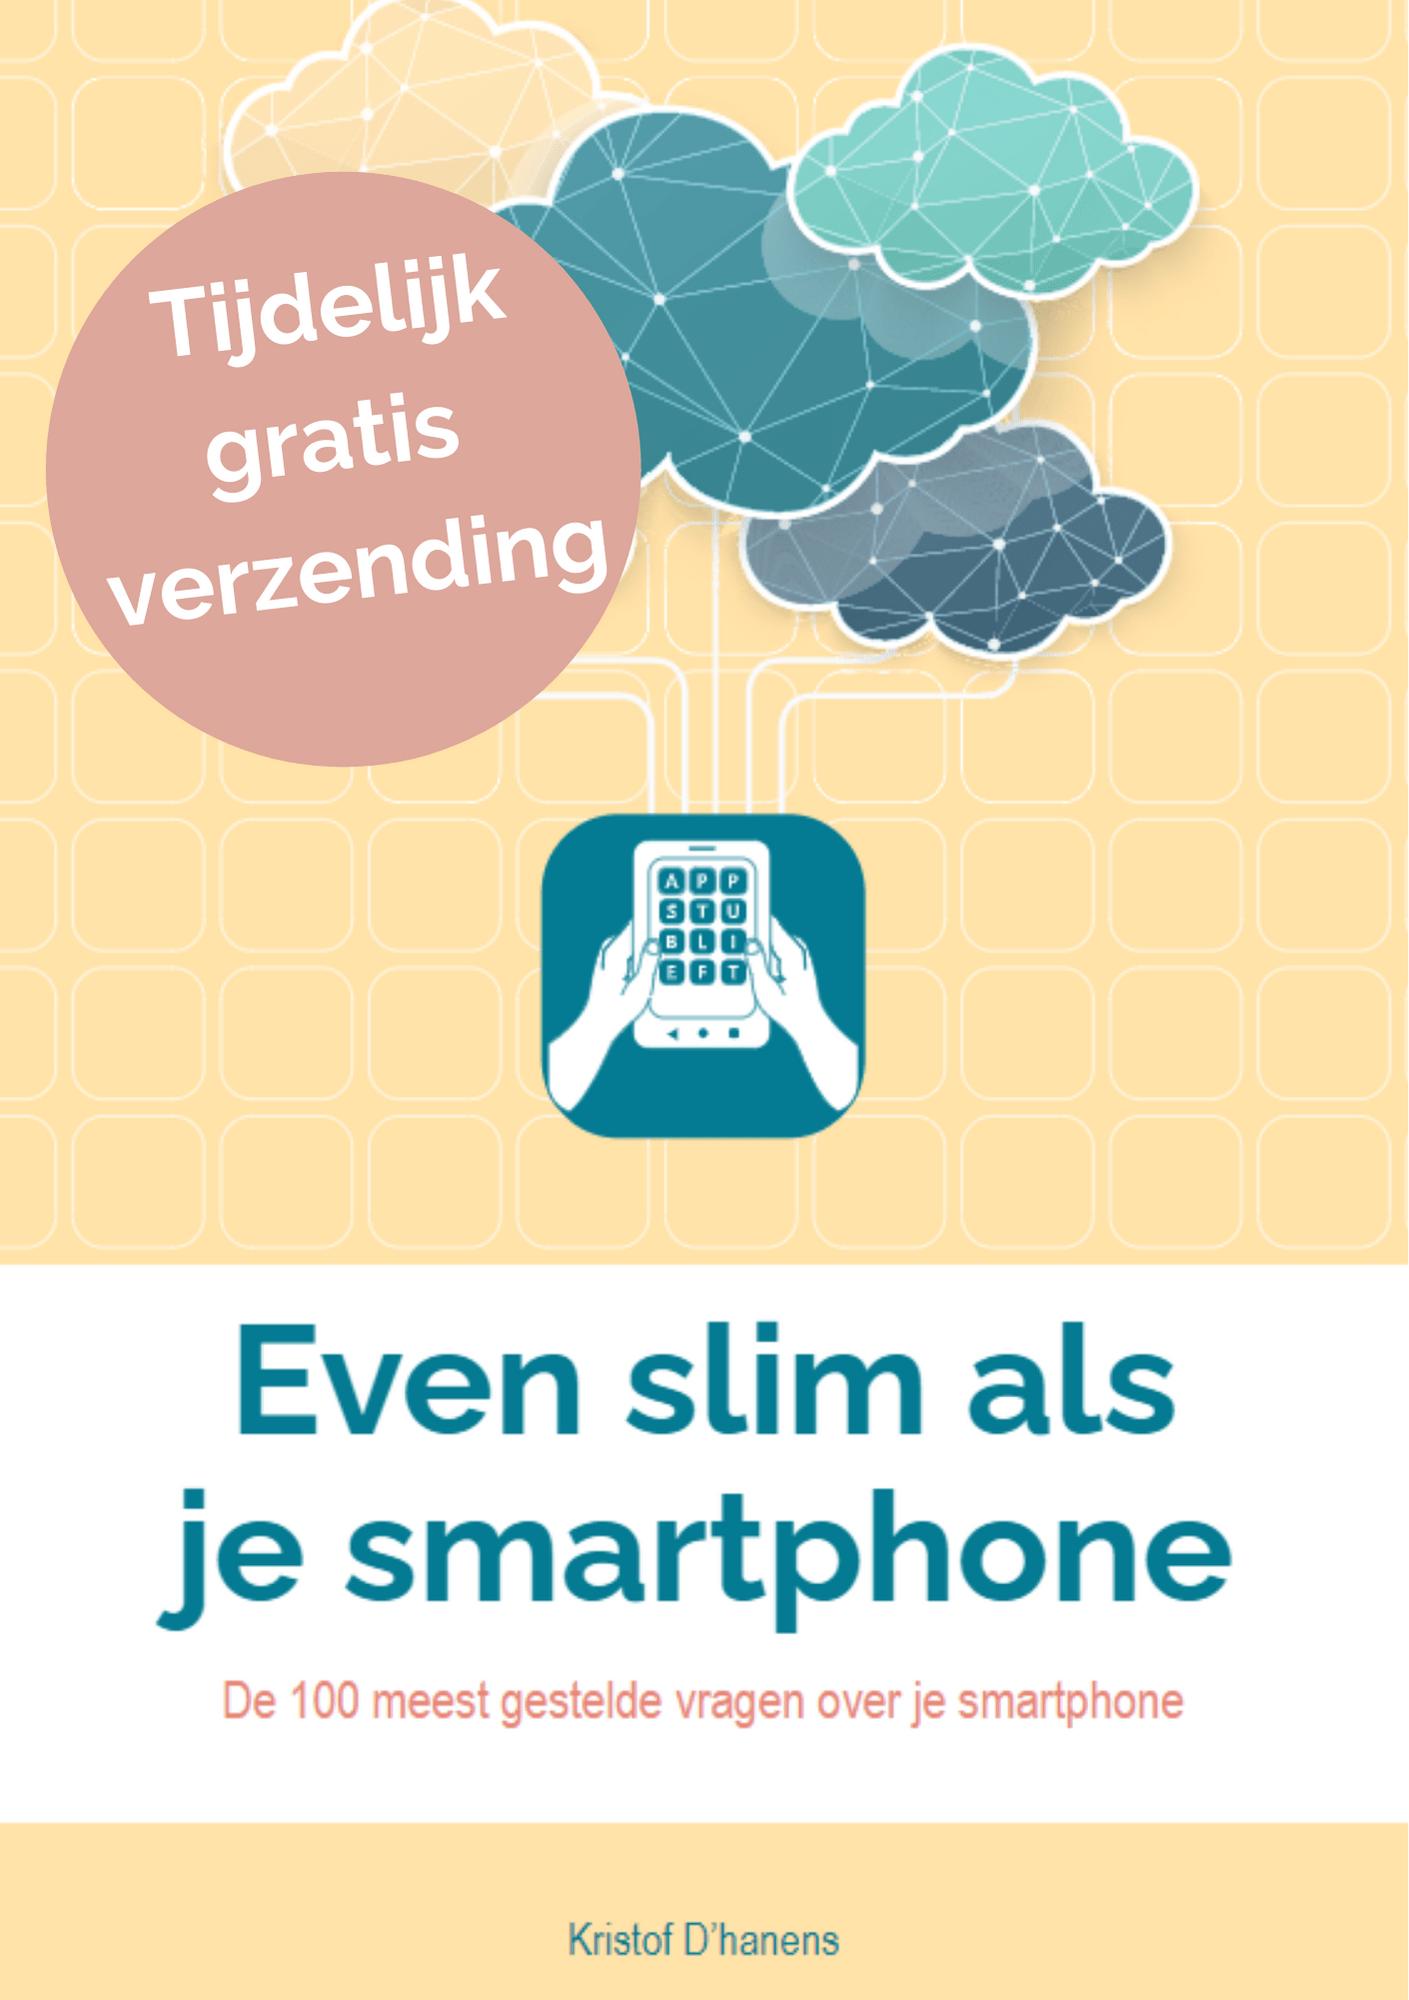 Even slim als je smartphone